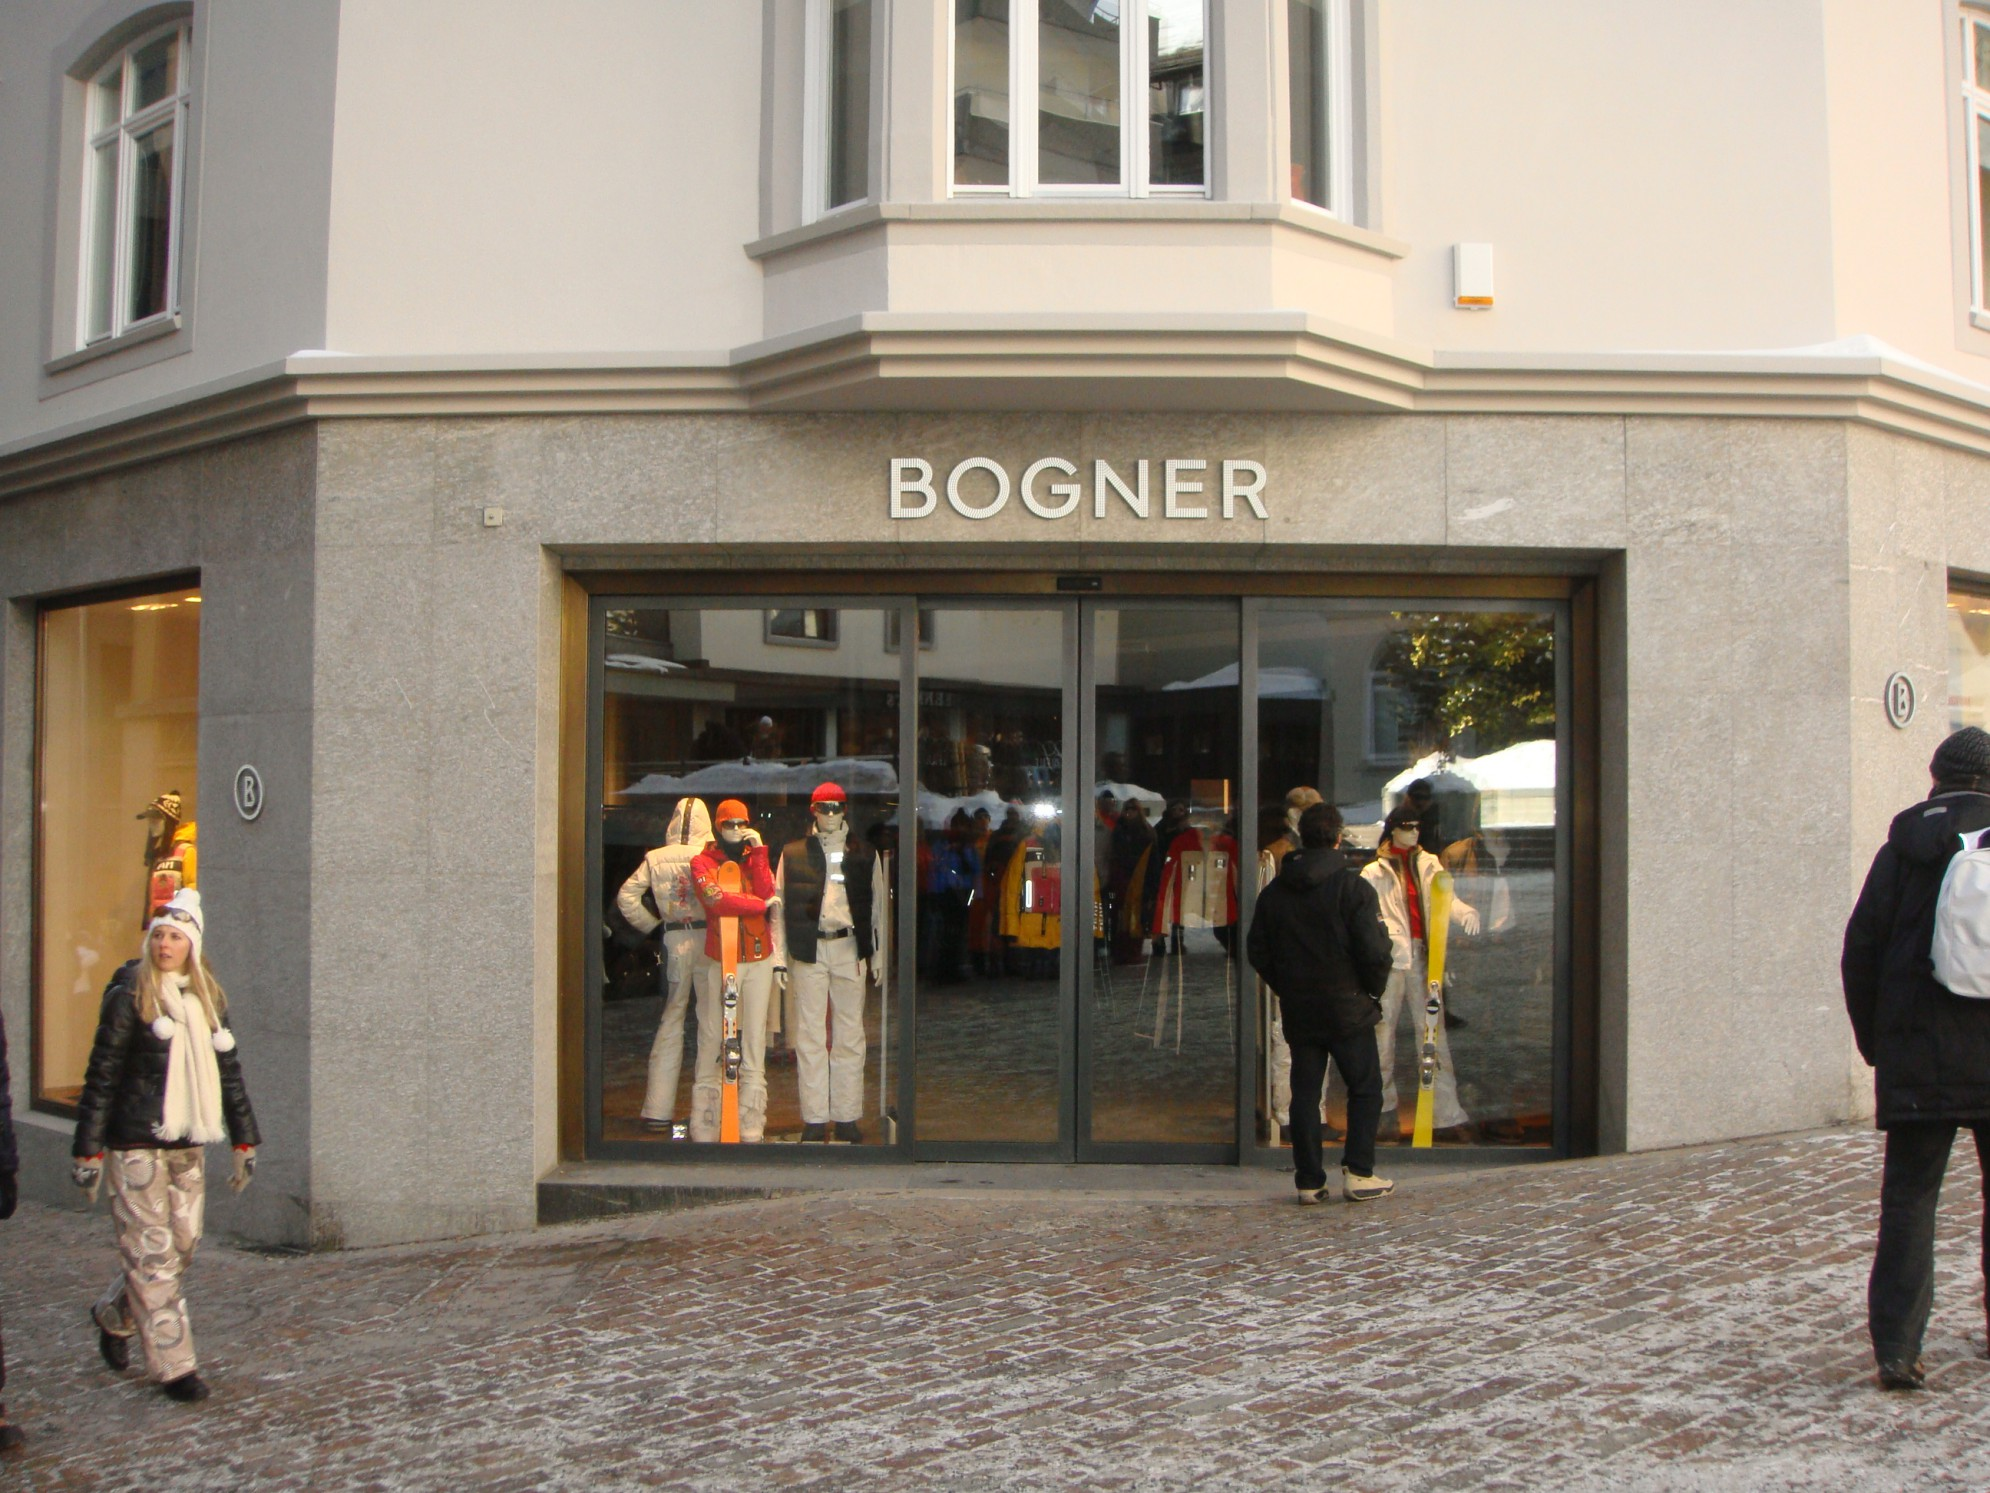 Le vetrine allestite stagione invernale del Negozio Bogner - Saint Moritz